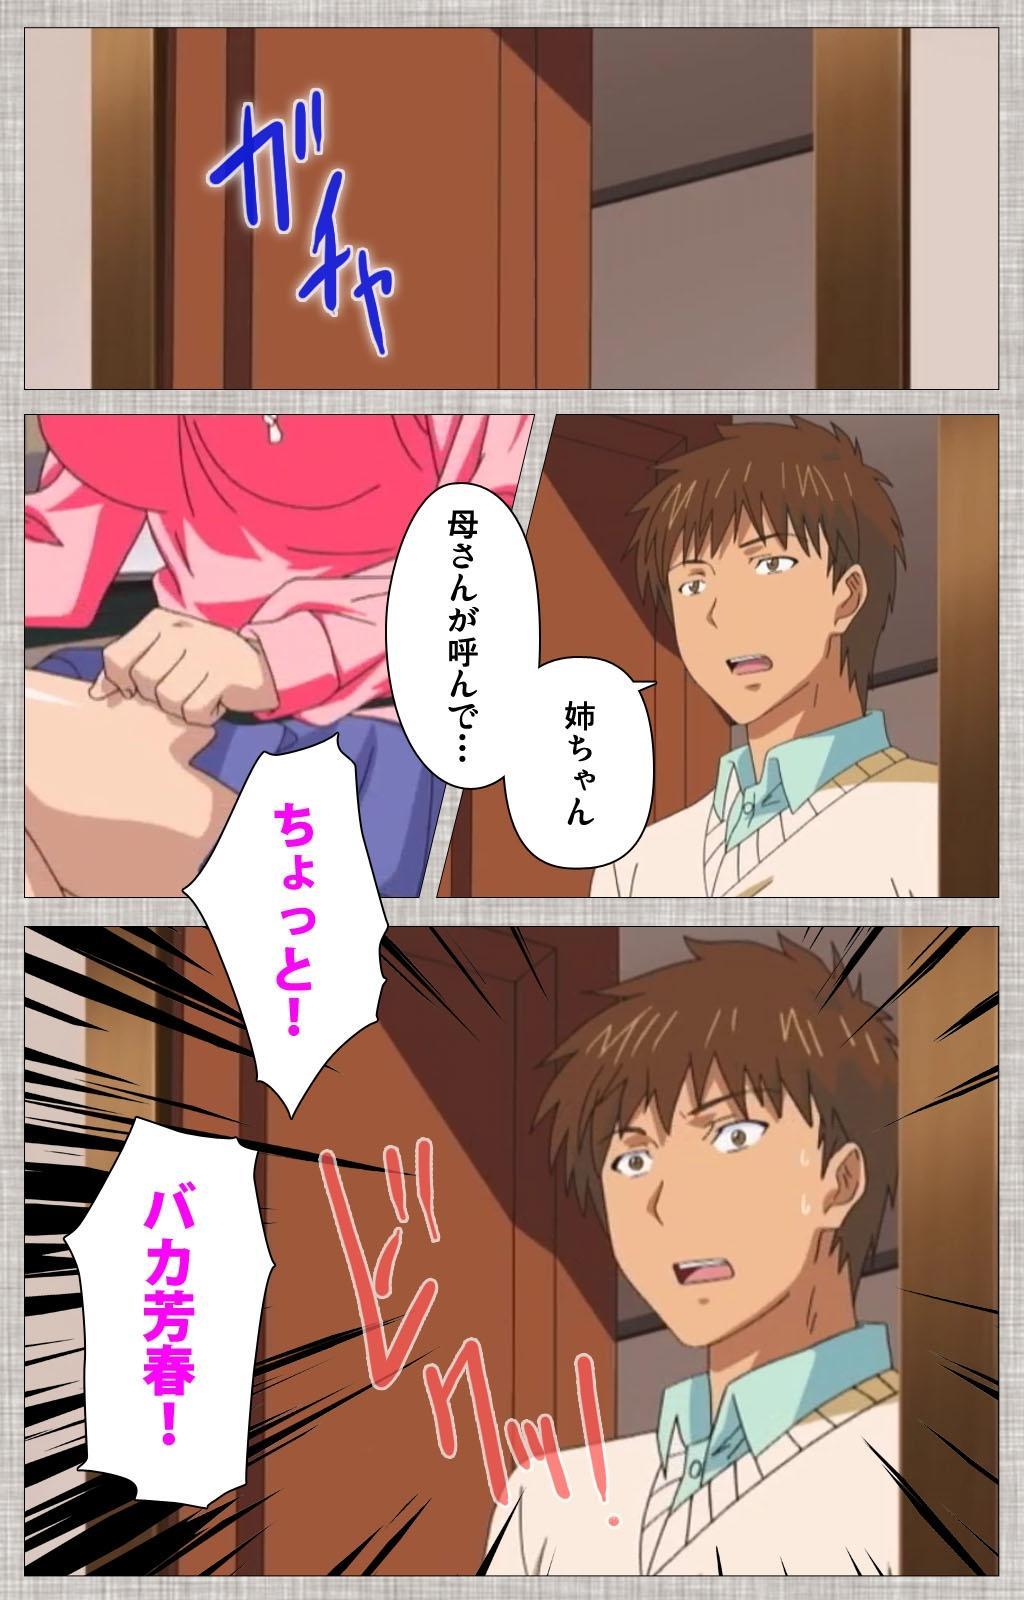 Ane-Koi #1 Complete Ban 5